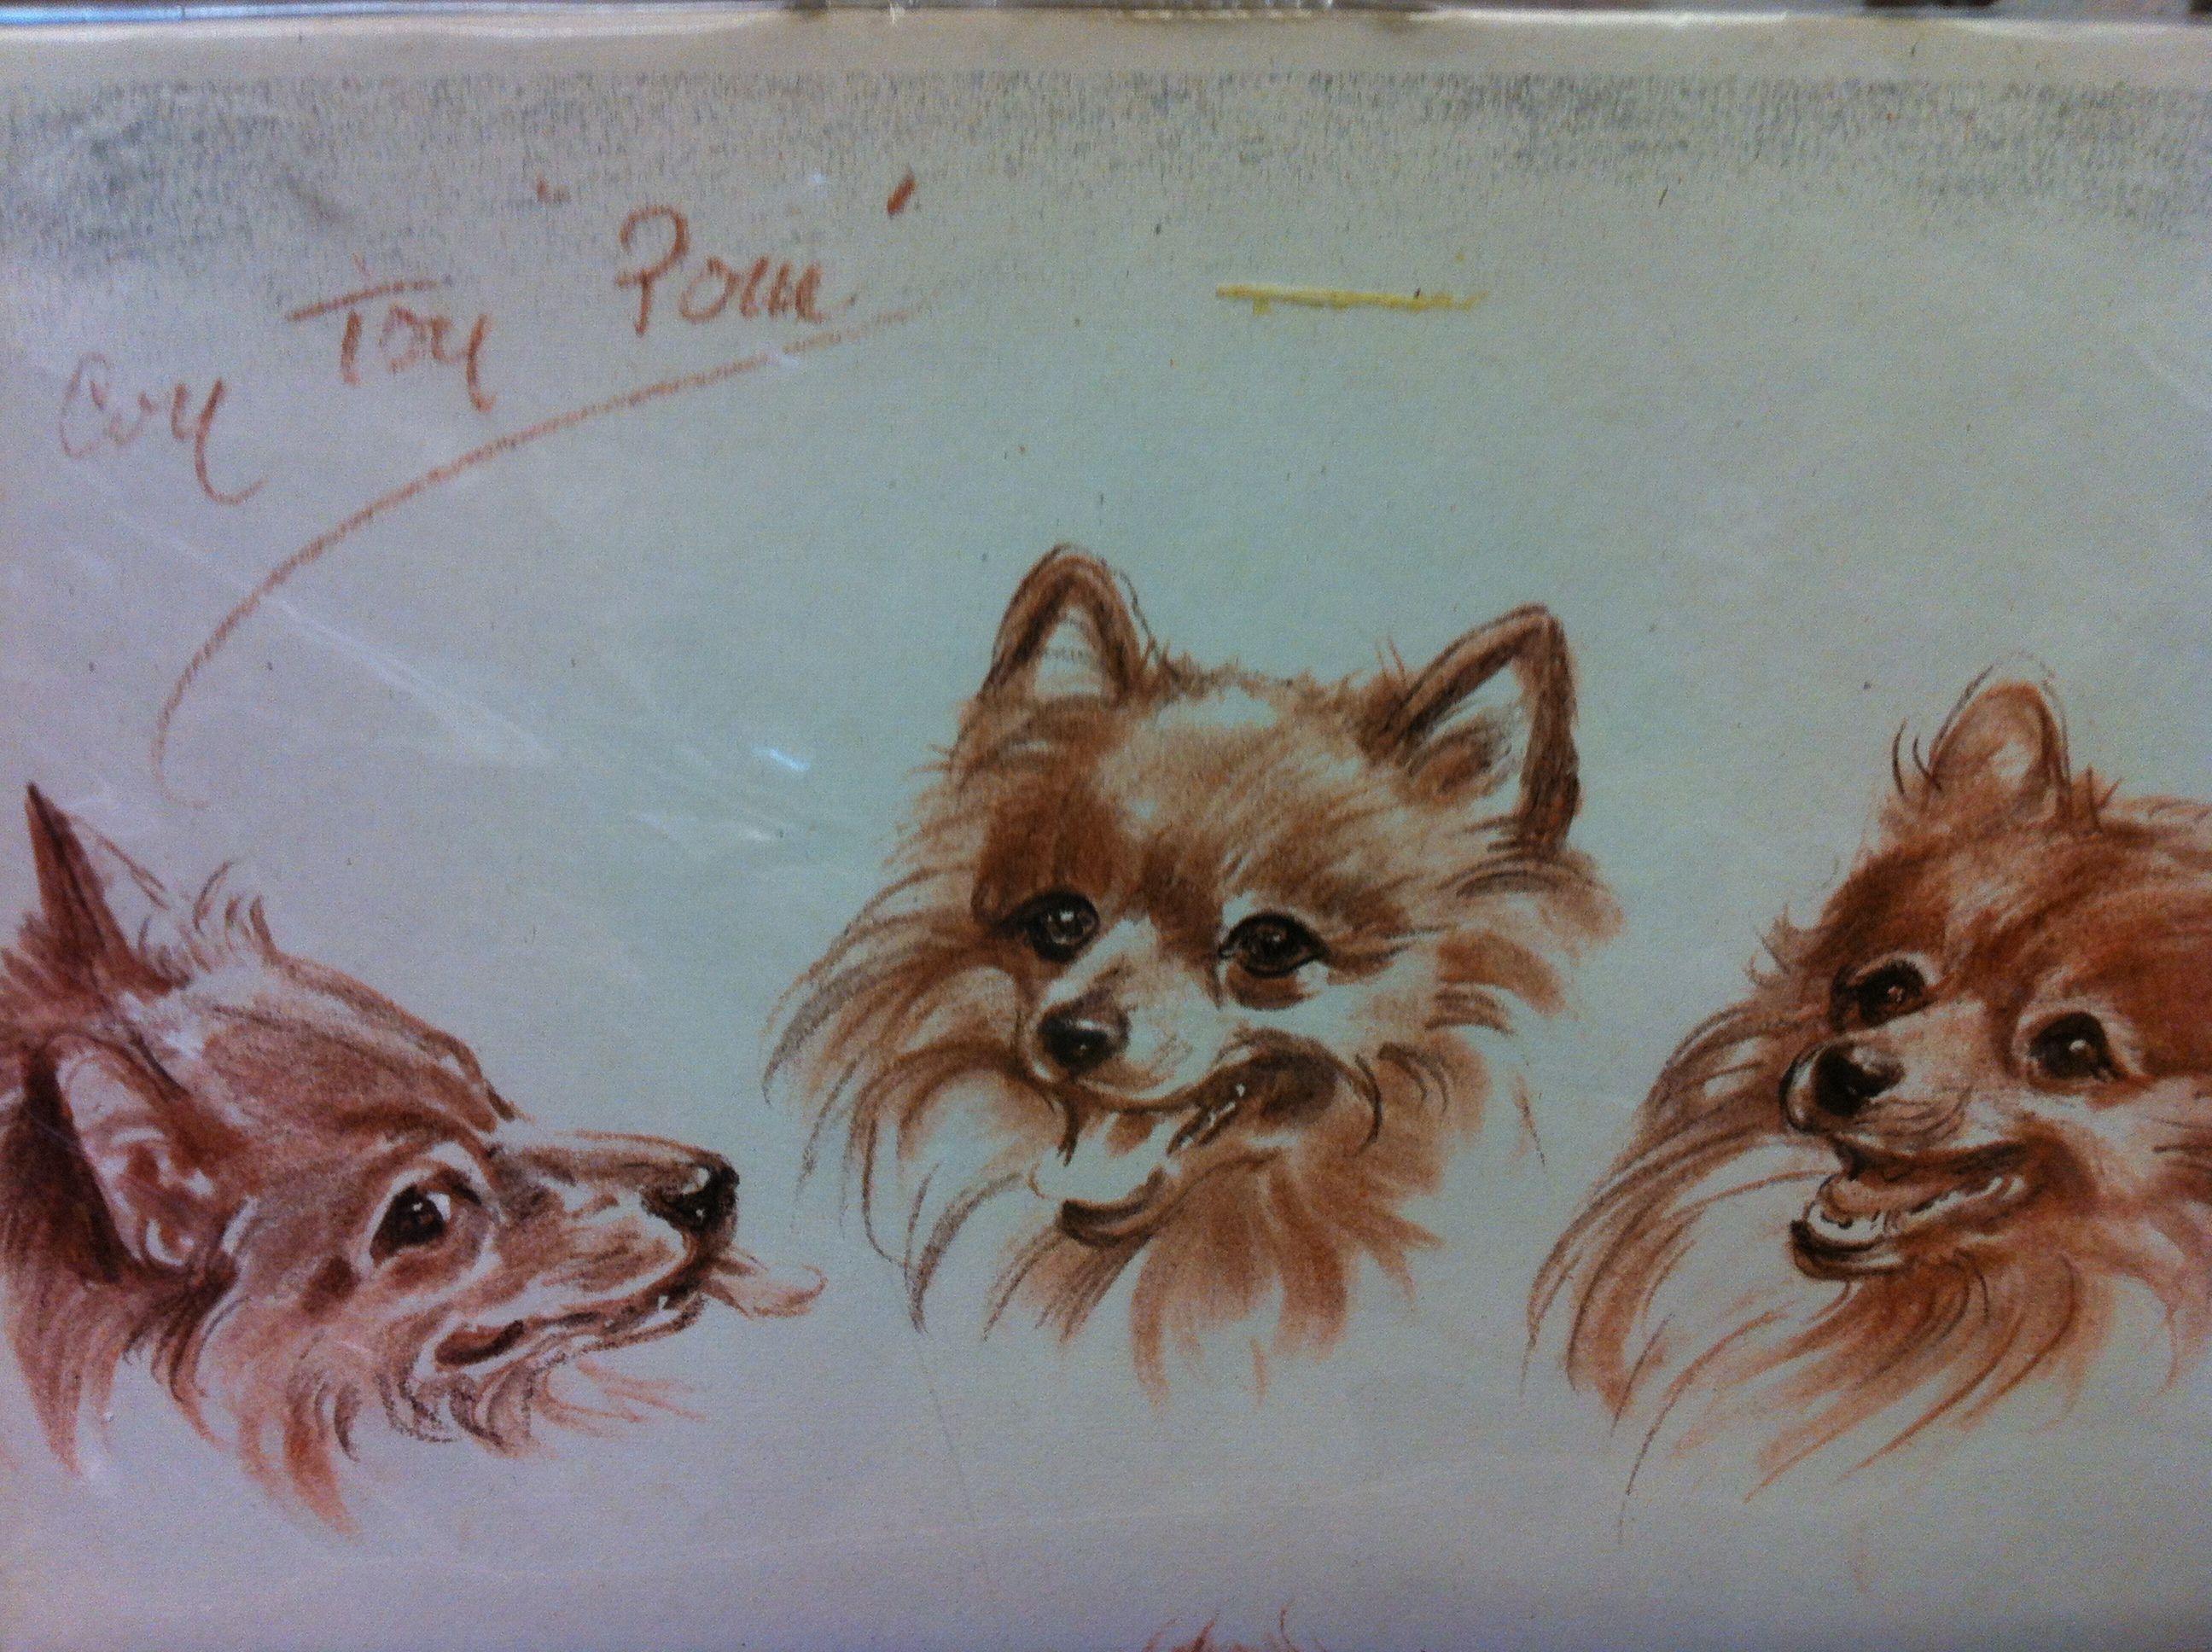 Pomeranian sketches   Pomeranian love   Pinterest   Pinturas de ...